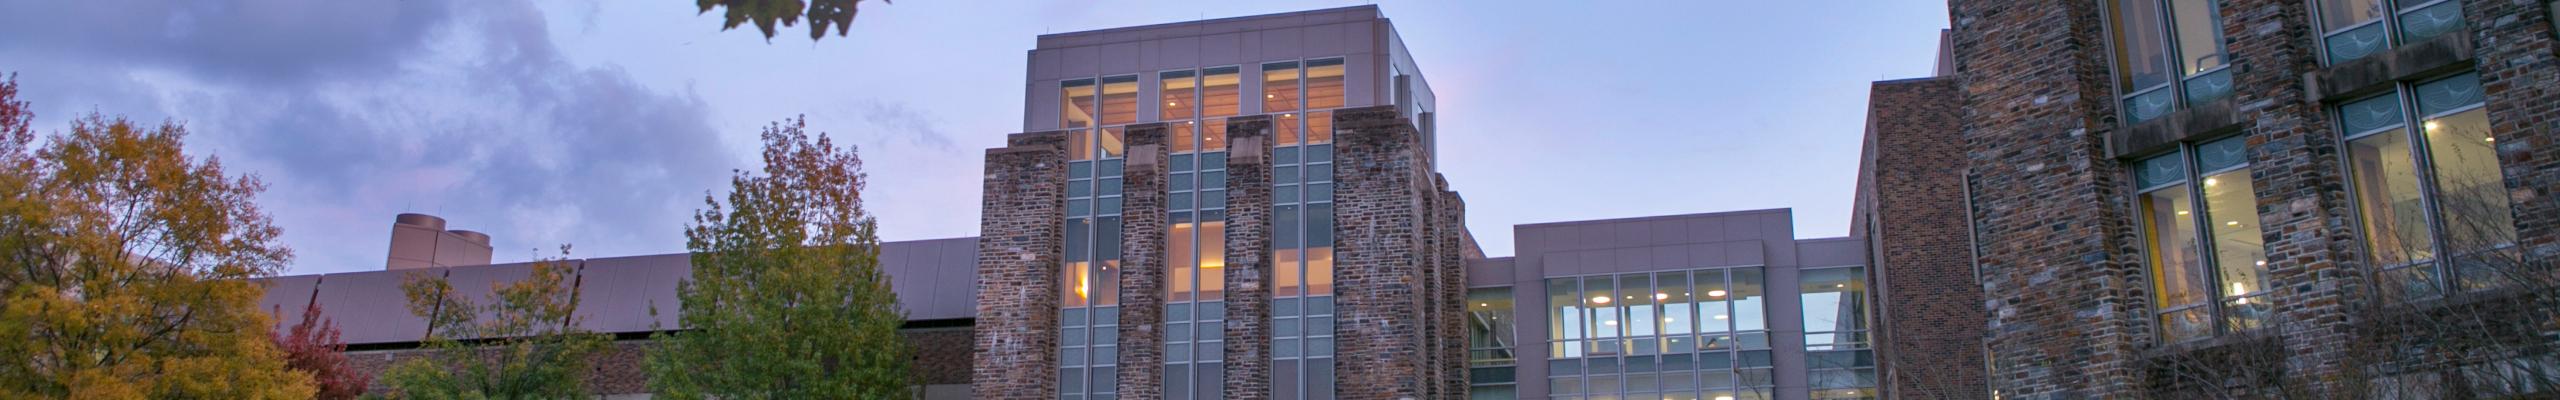 The Fitzpatrick Center at Duke University